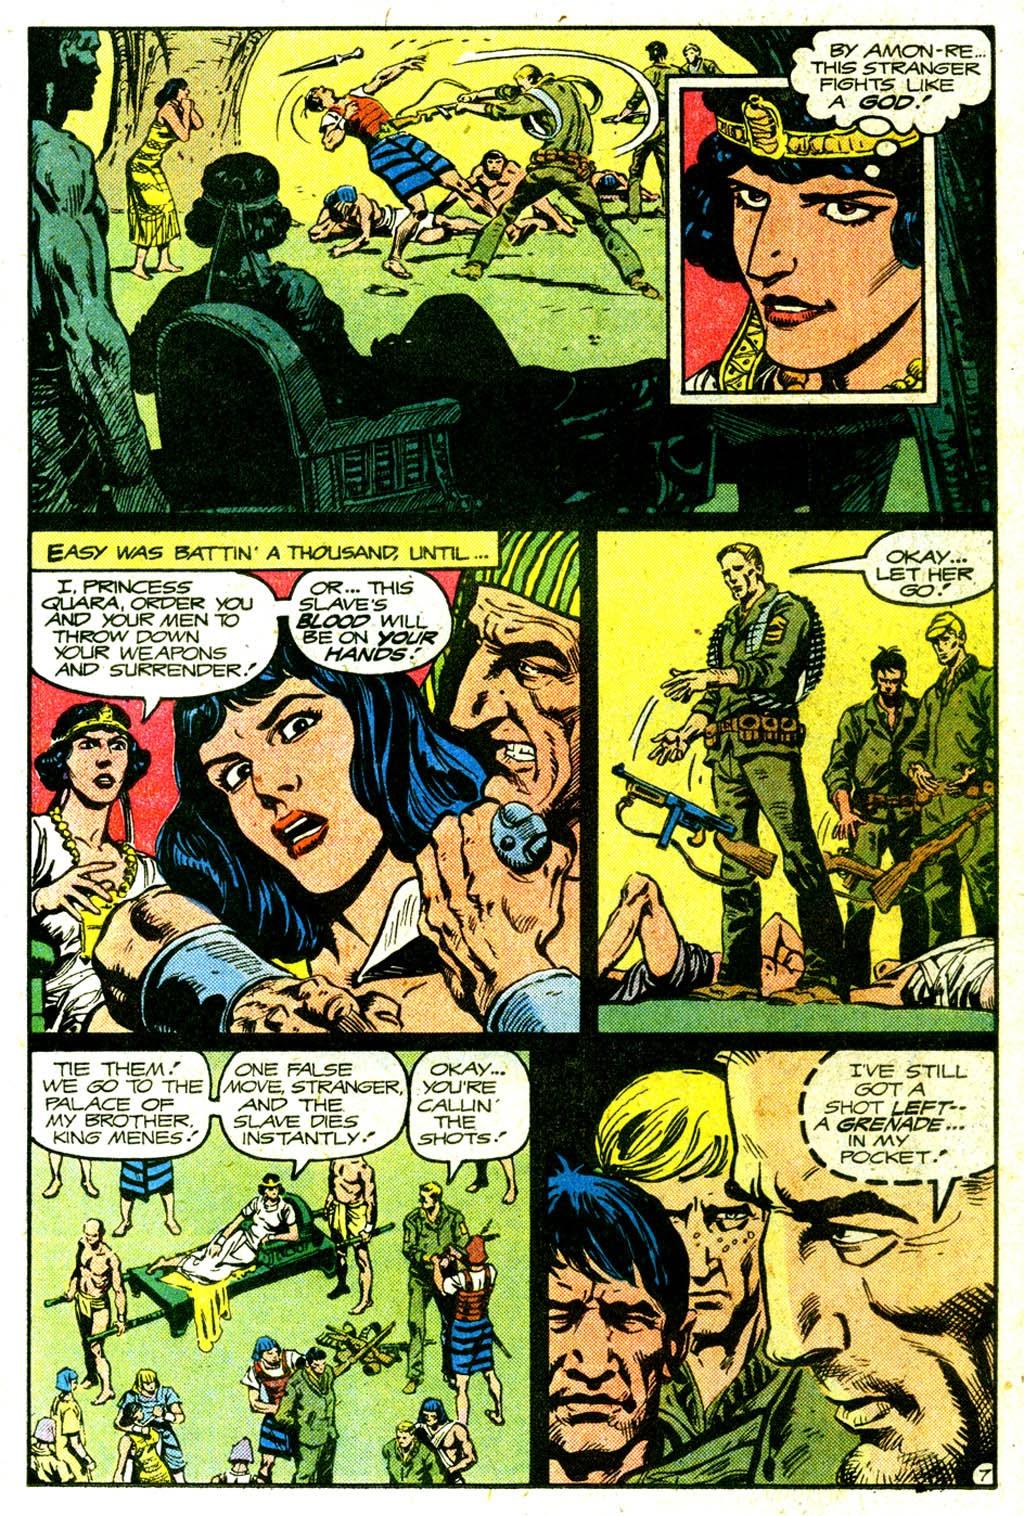 Read online Sgt. Rock comic -  Issue #332 - 10